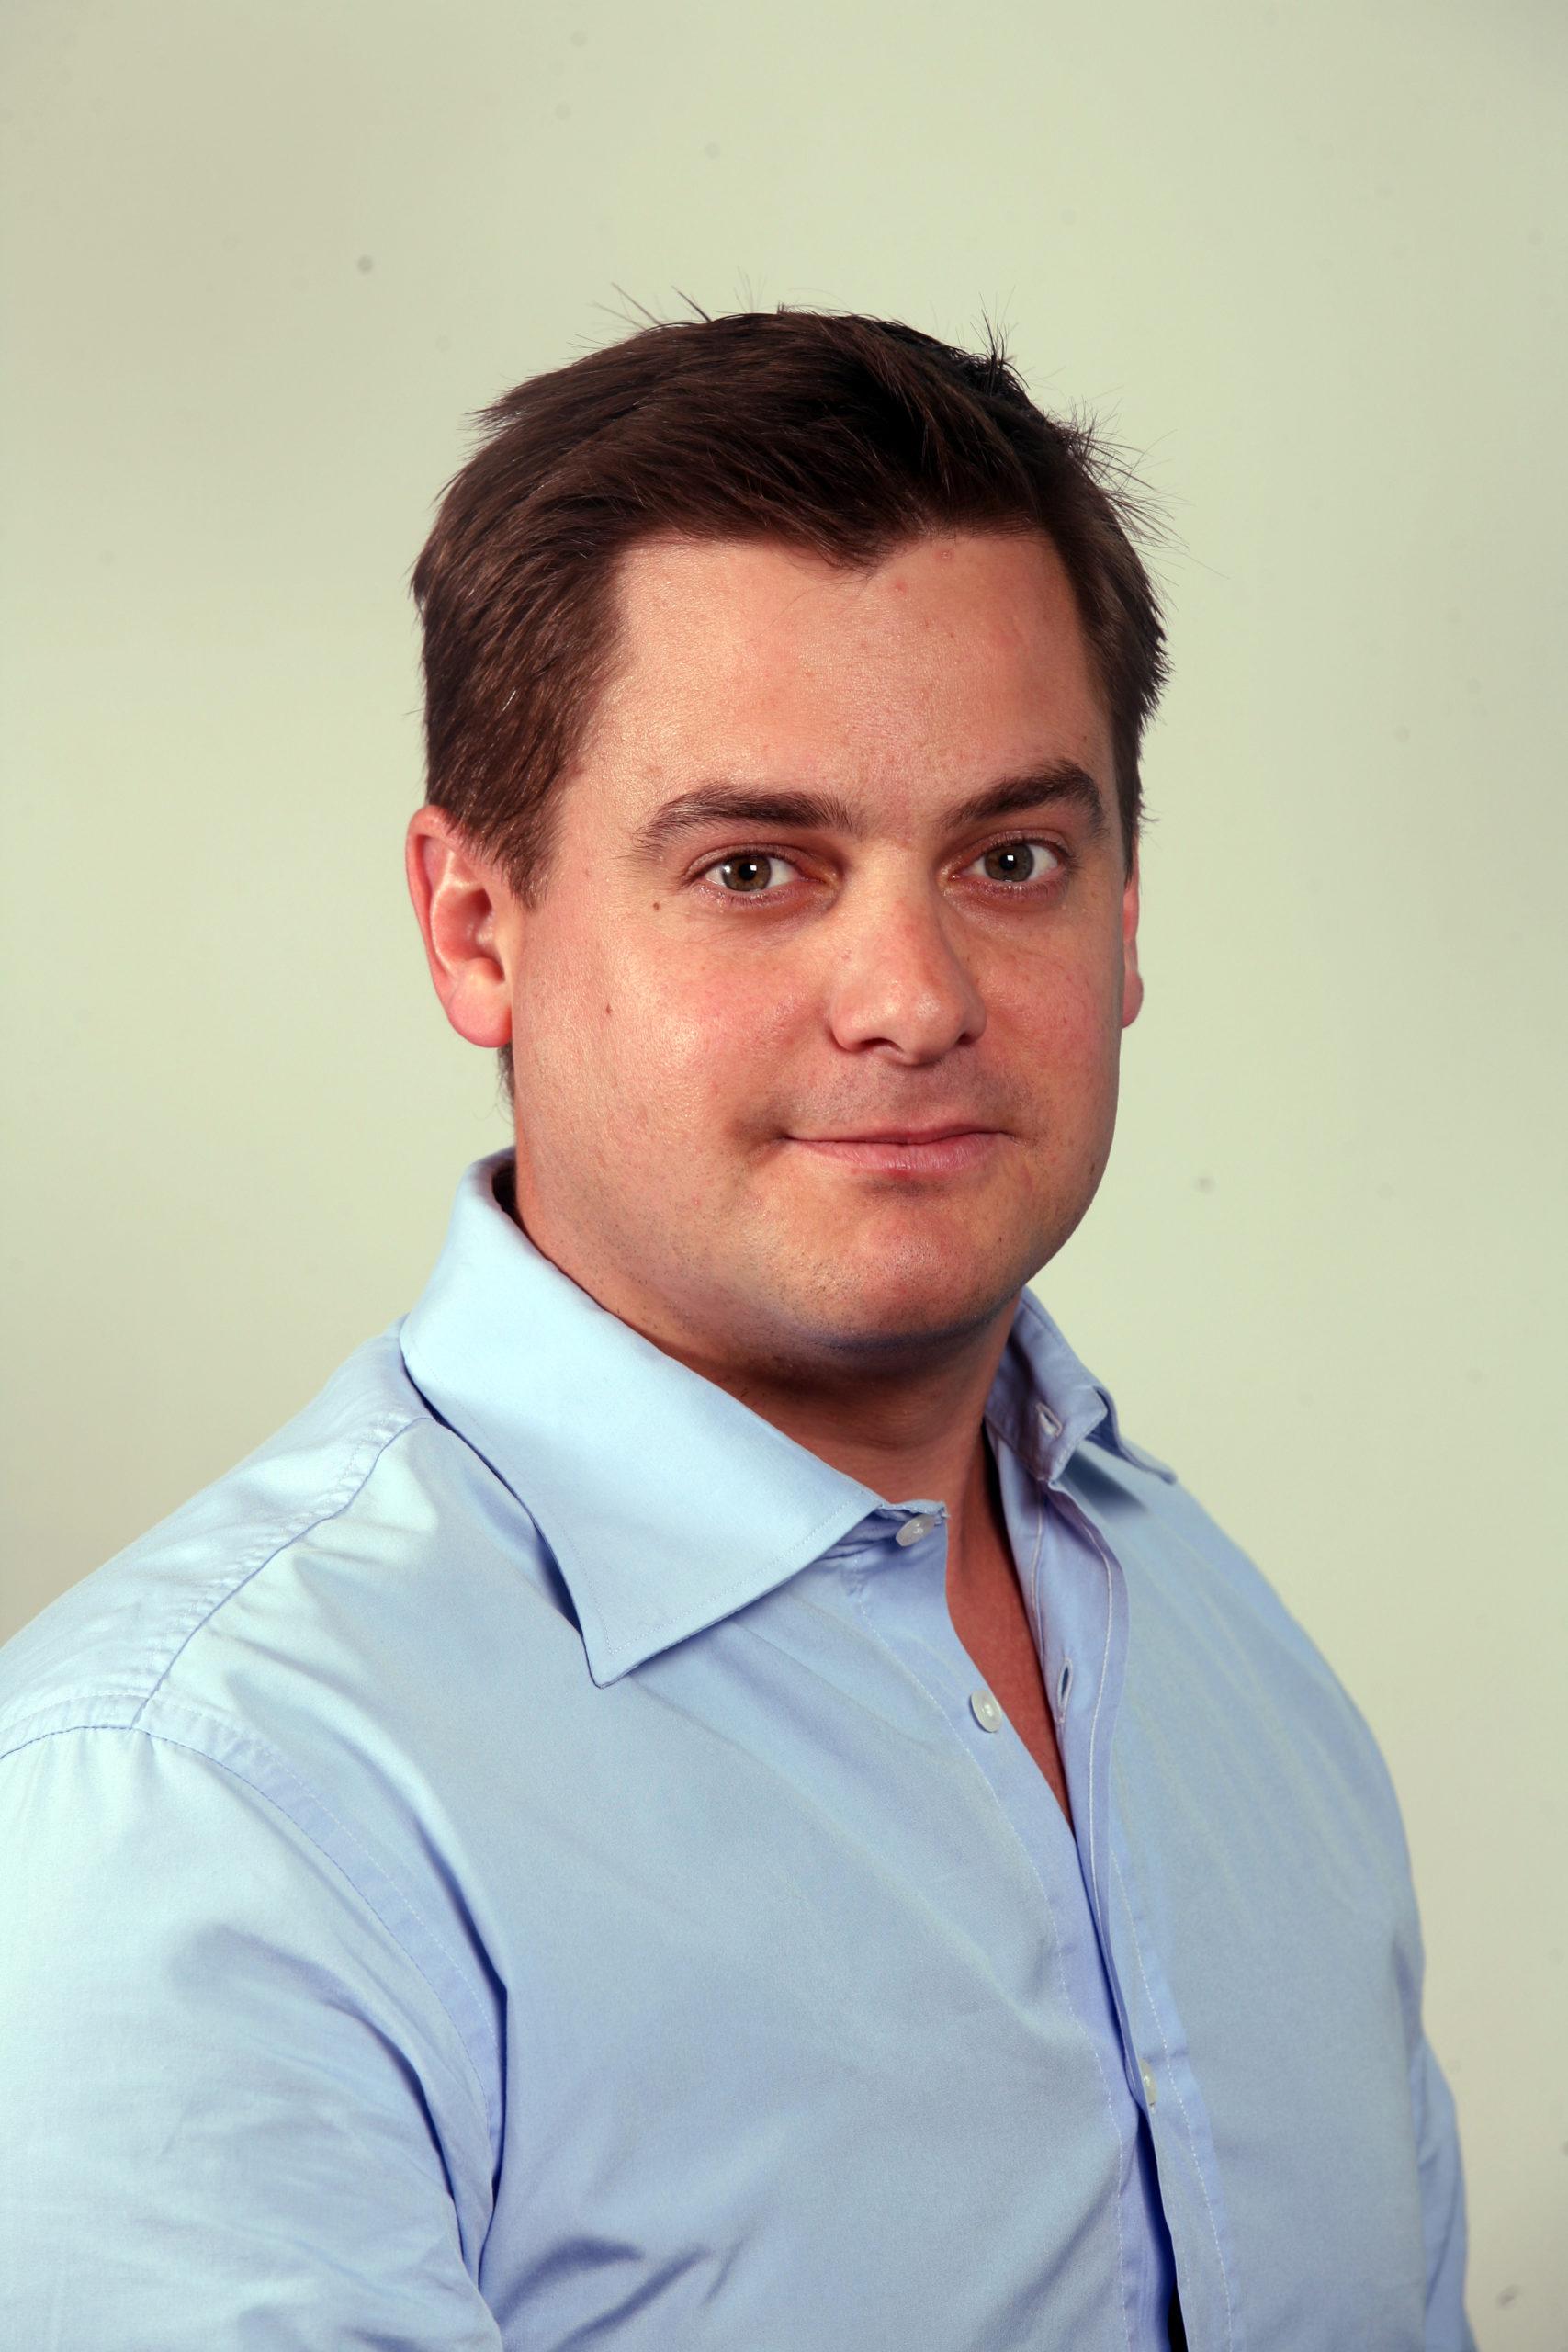 Justin Tremain